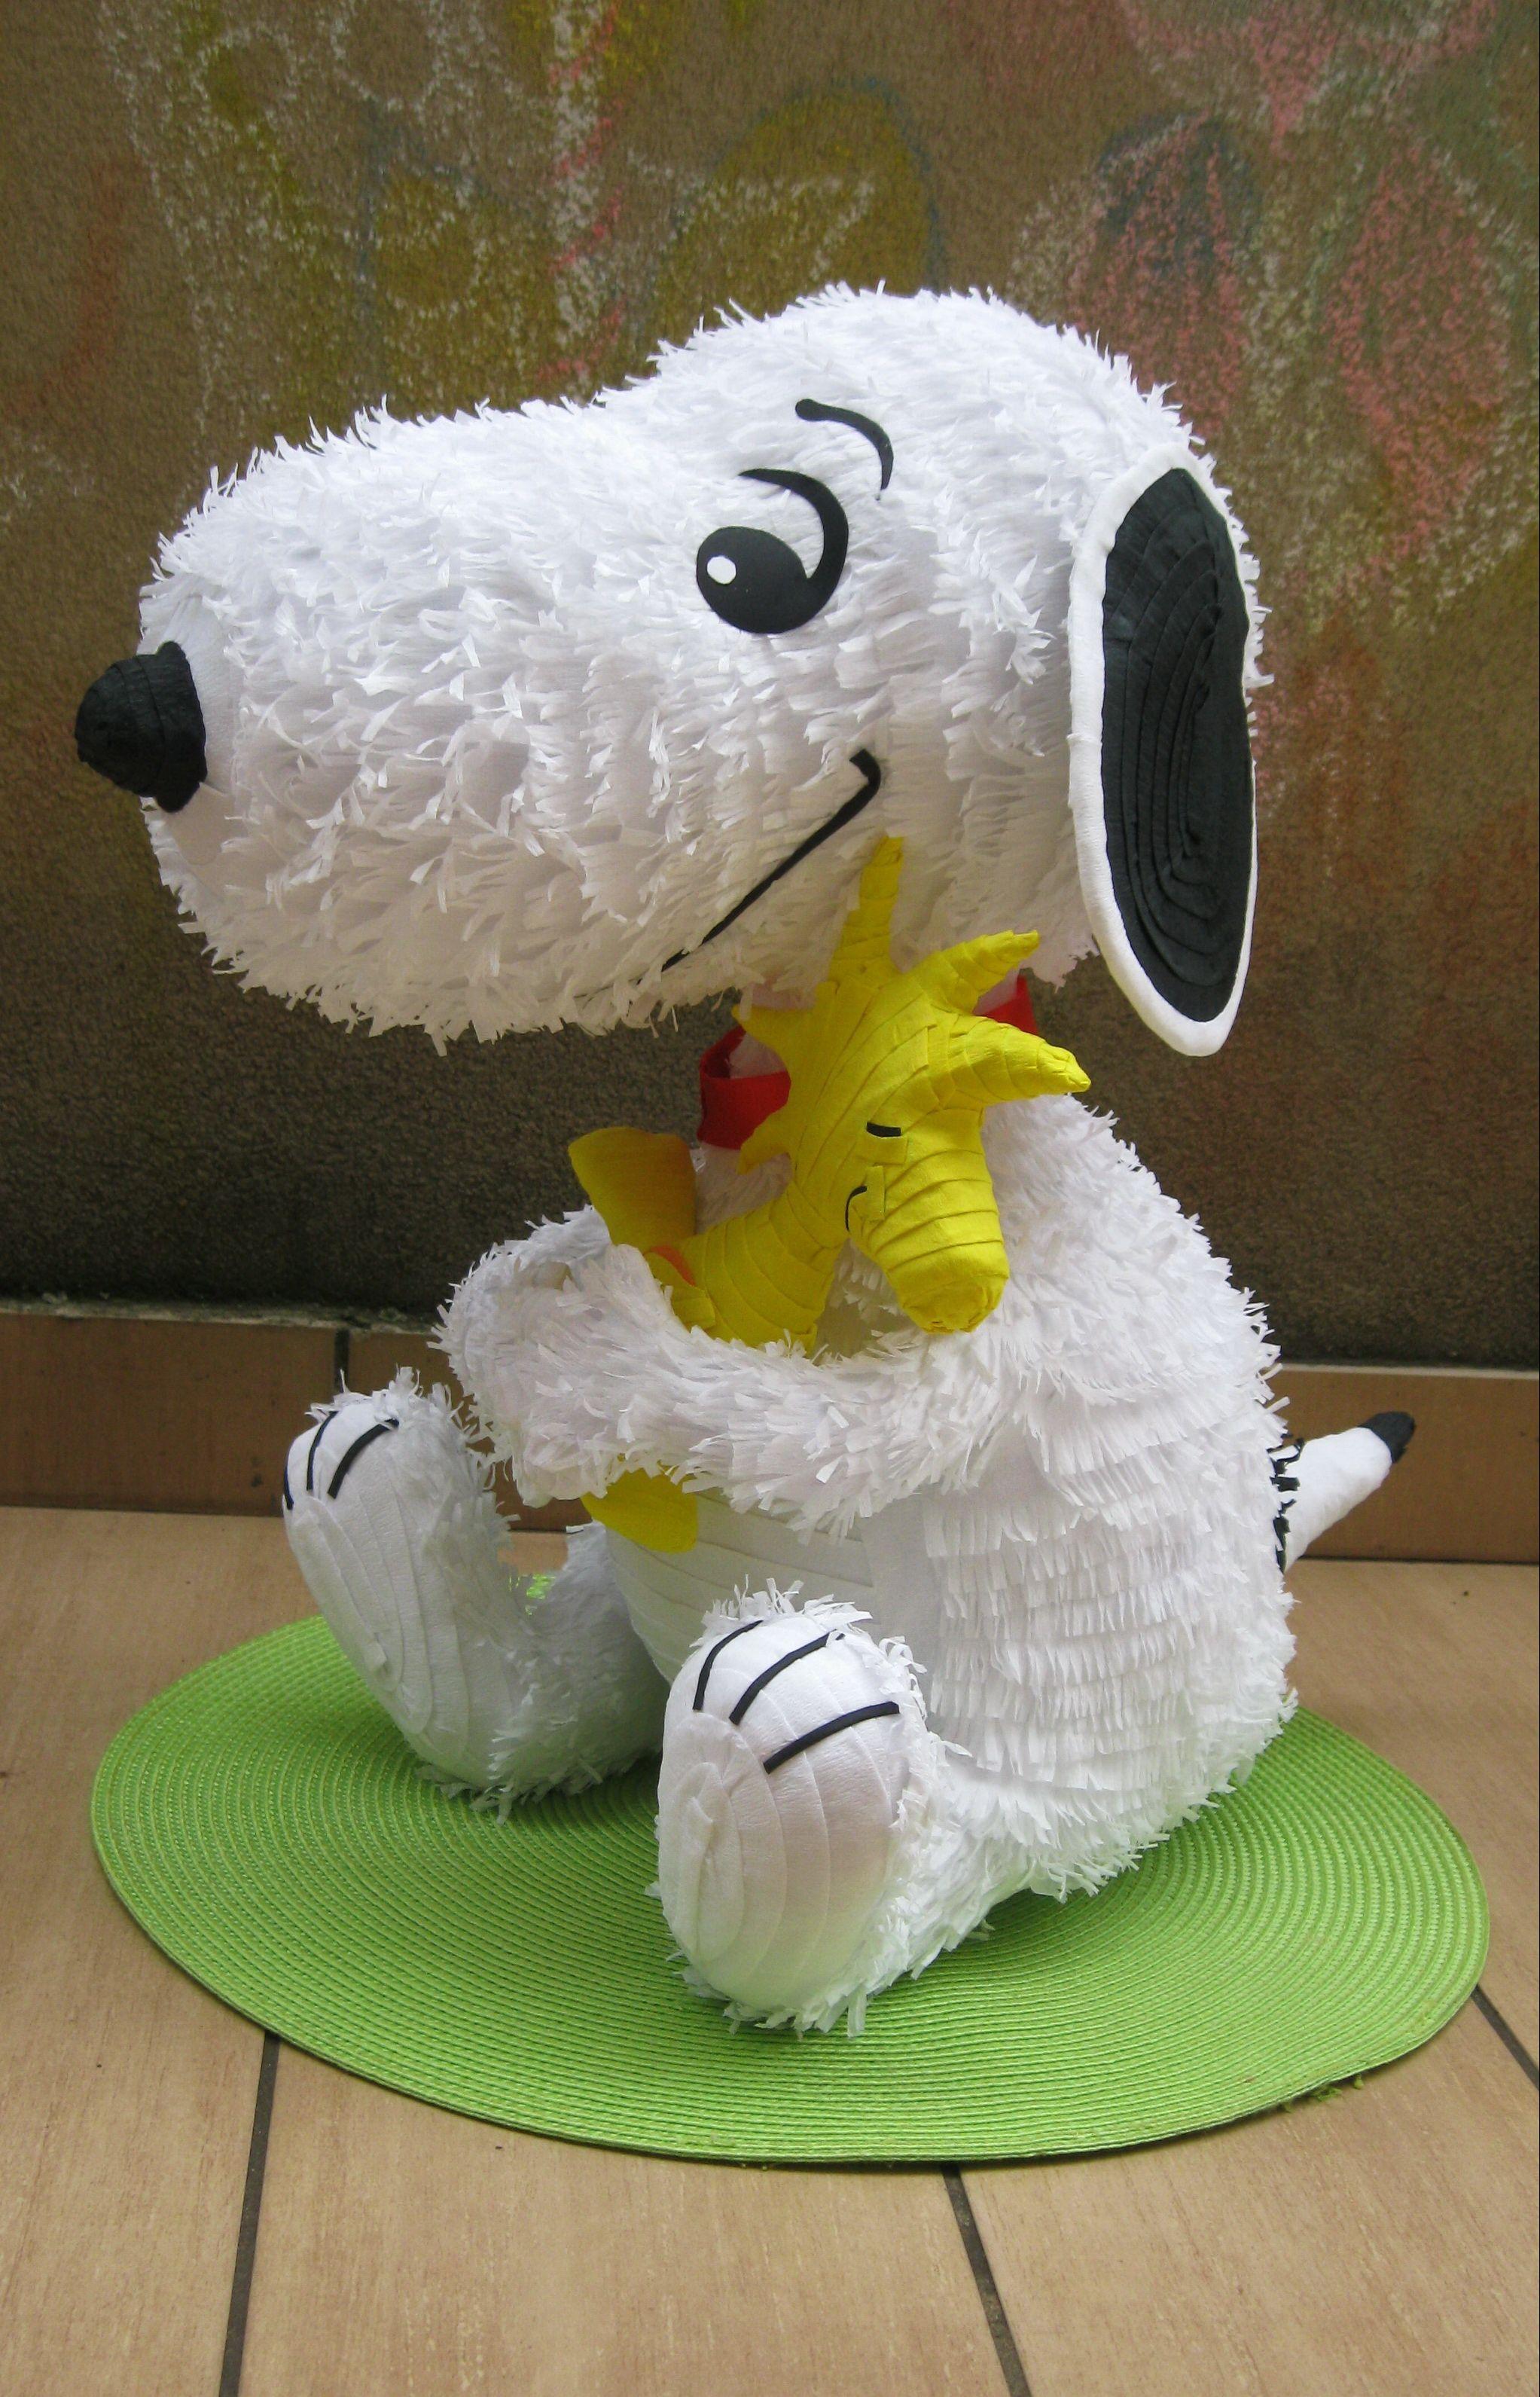 Snoopy pinata unine i jelenine pinjate pinterest pi atas fiestas y cumplea os - Pinatas de cumpleanos ...